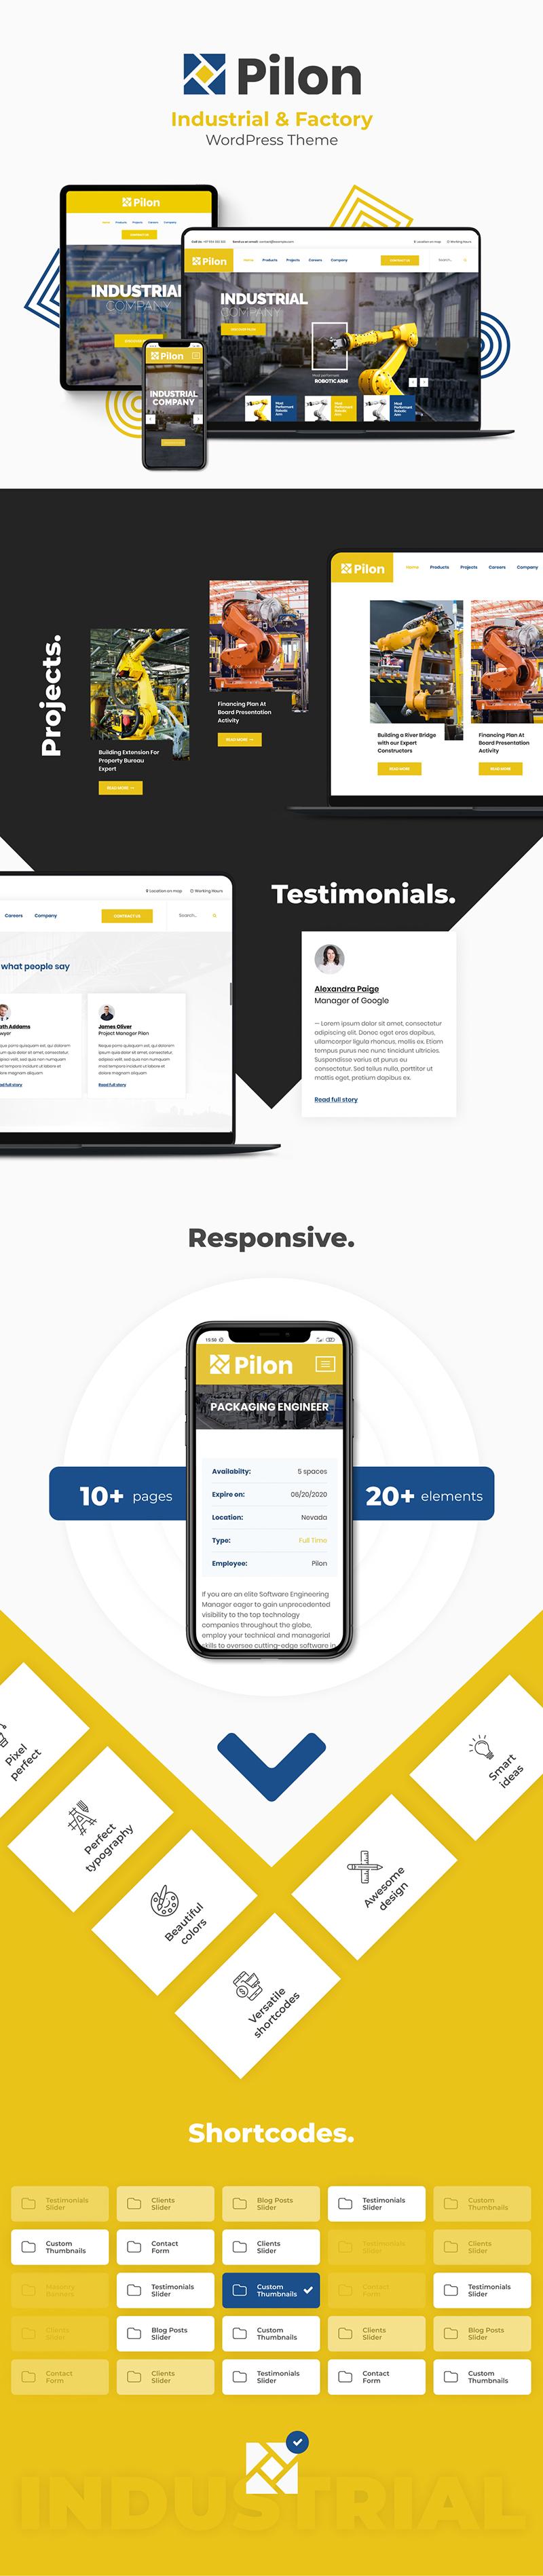 Pilon - Industrial & Factory WordPress Theme - 3